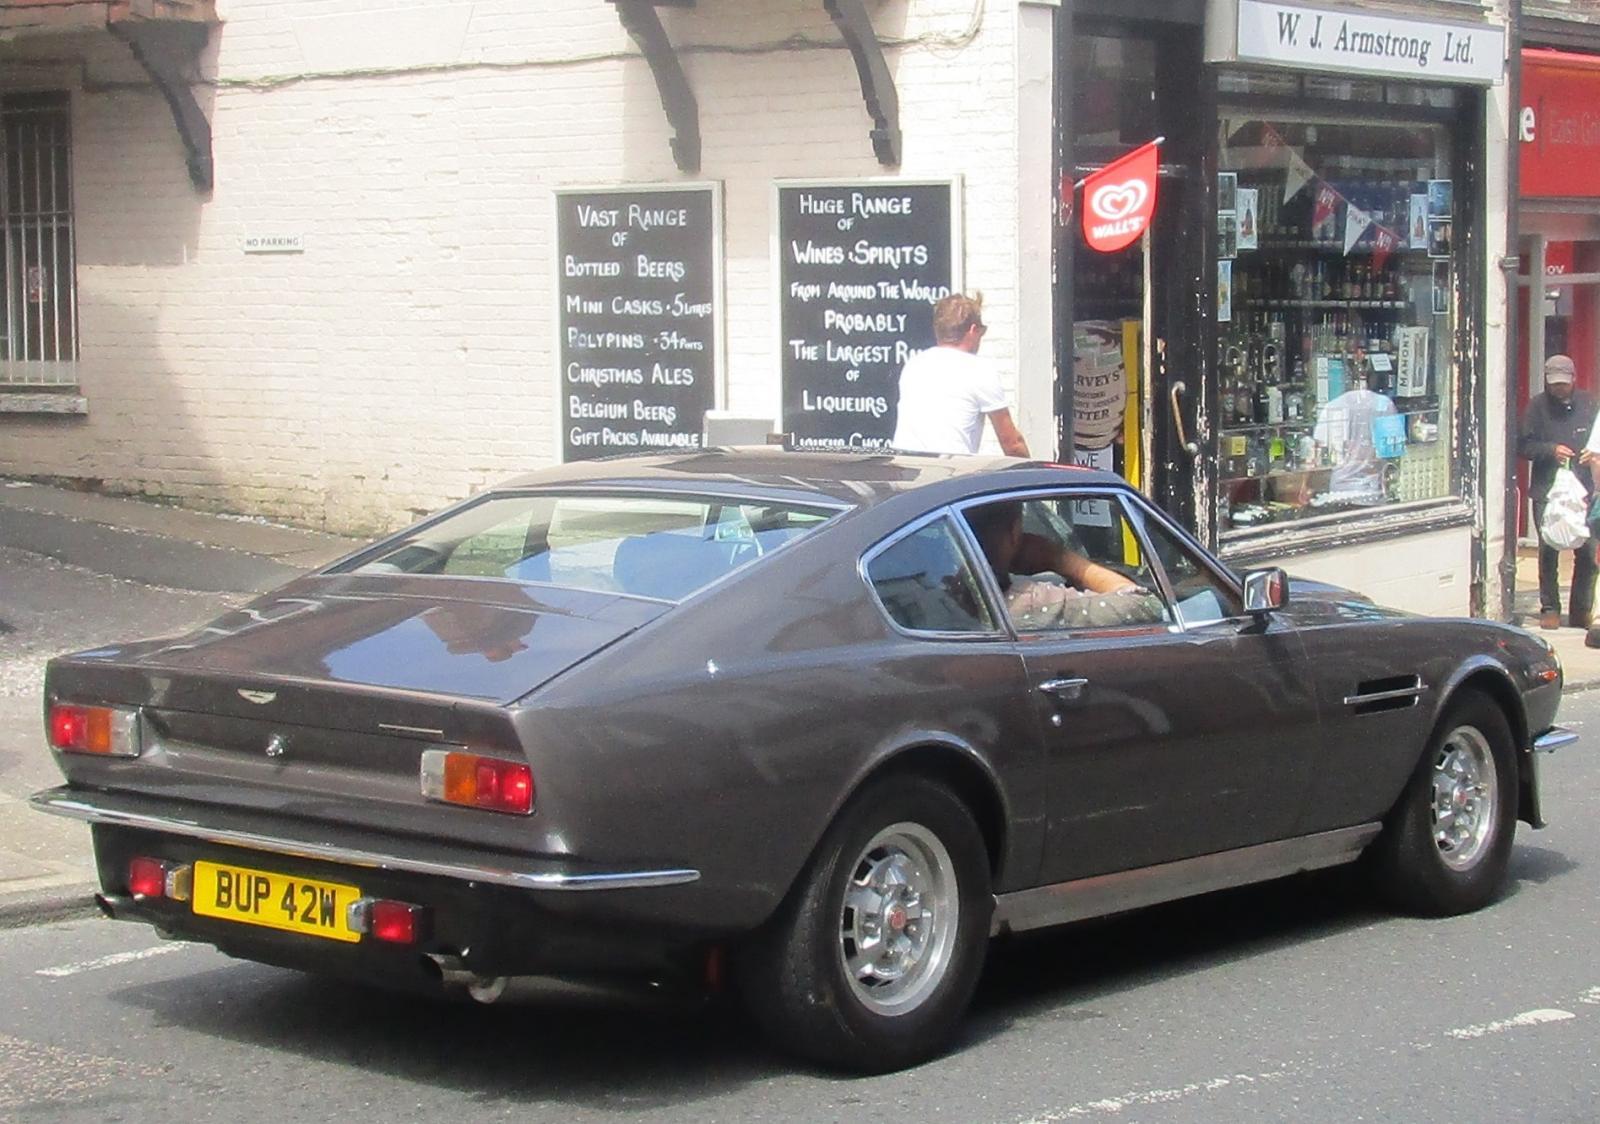 1980 Aston Martin Vantage Mar 2004.JPG